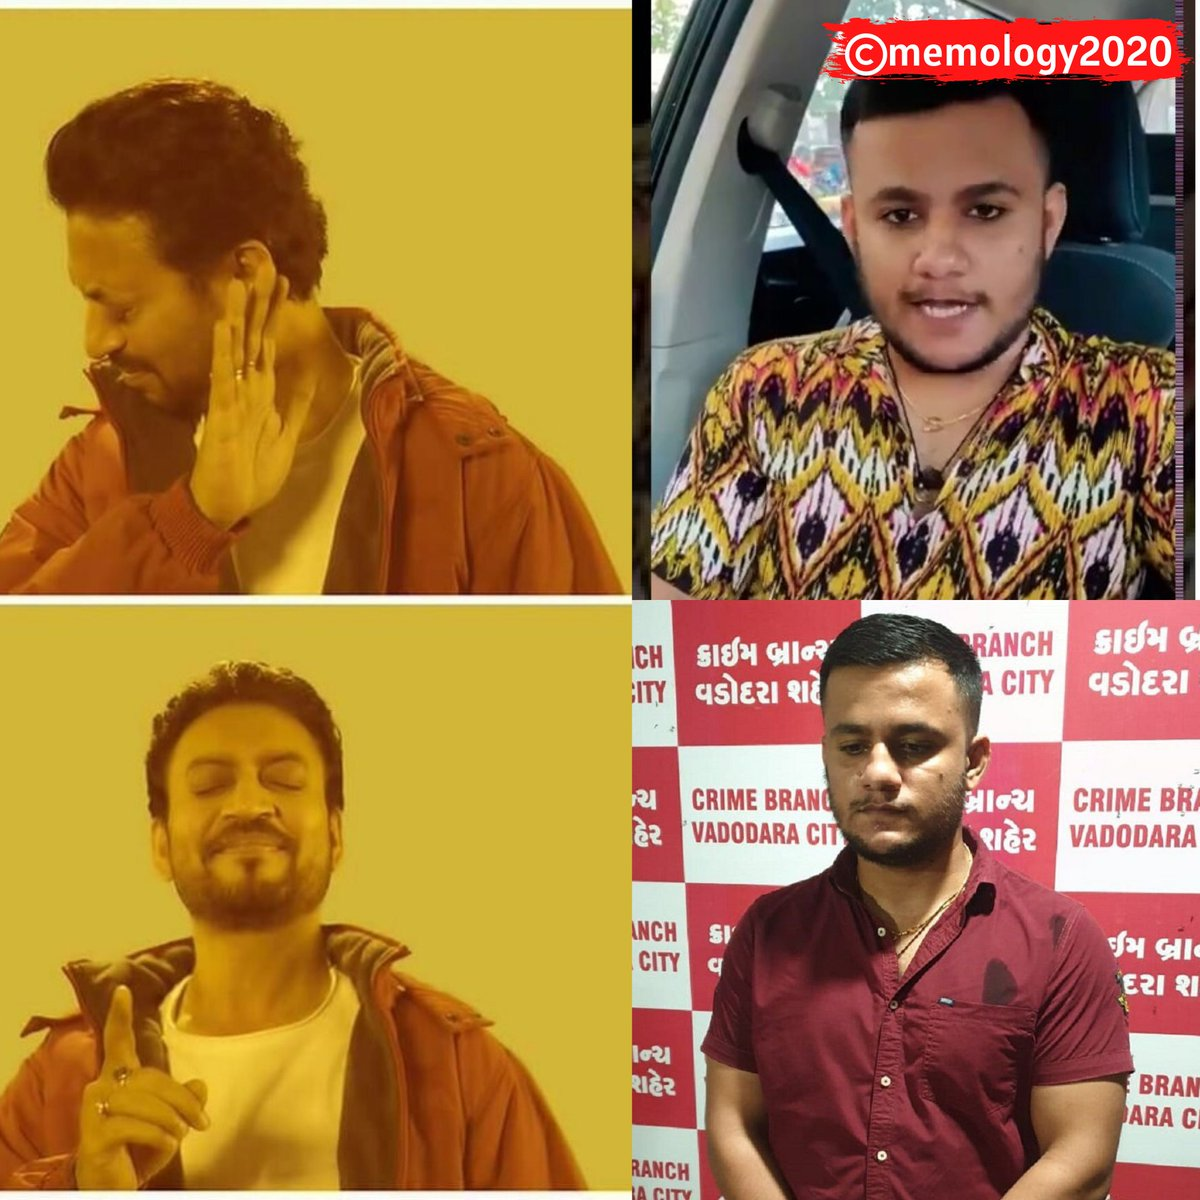 #memology2020 #shubhammishra #subhammishra #shubhammishramemes #indianmemes #hindimemes #originalmemes #cyberbullying #vadodara #vadodarapolice #baroda #trendingmemes #truememes #trending #trendingnow #viralmemes #cbseresults2020  #agrimajoshua #agrima #gujarat #gujaratpolice #Nopic.twitter.com/ZiKvShL4sG